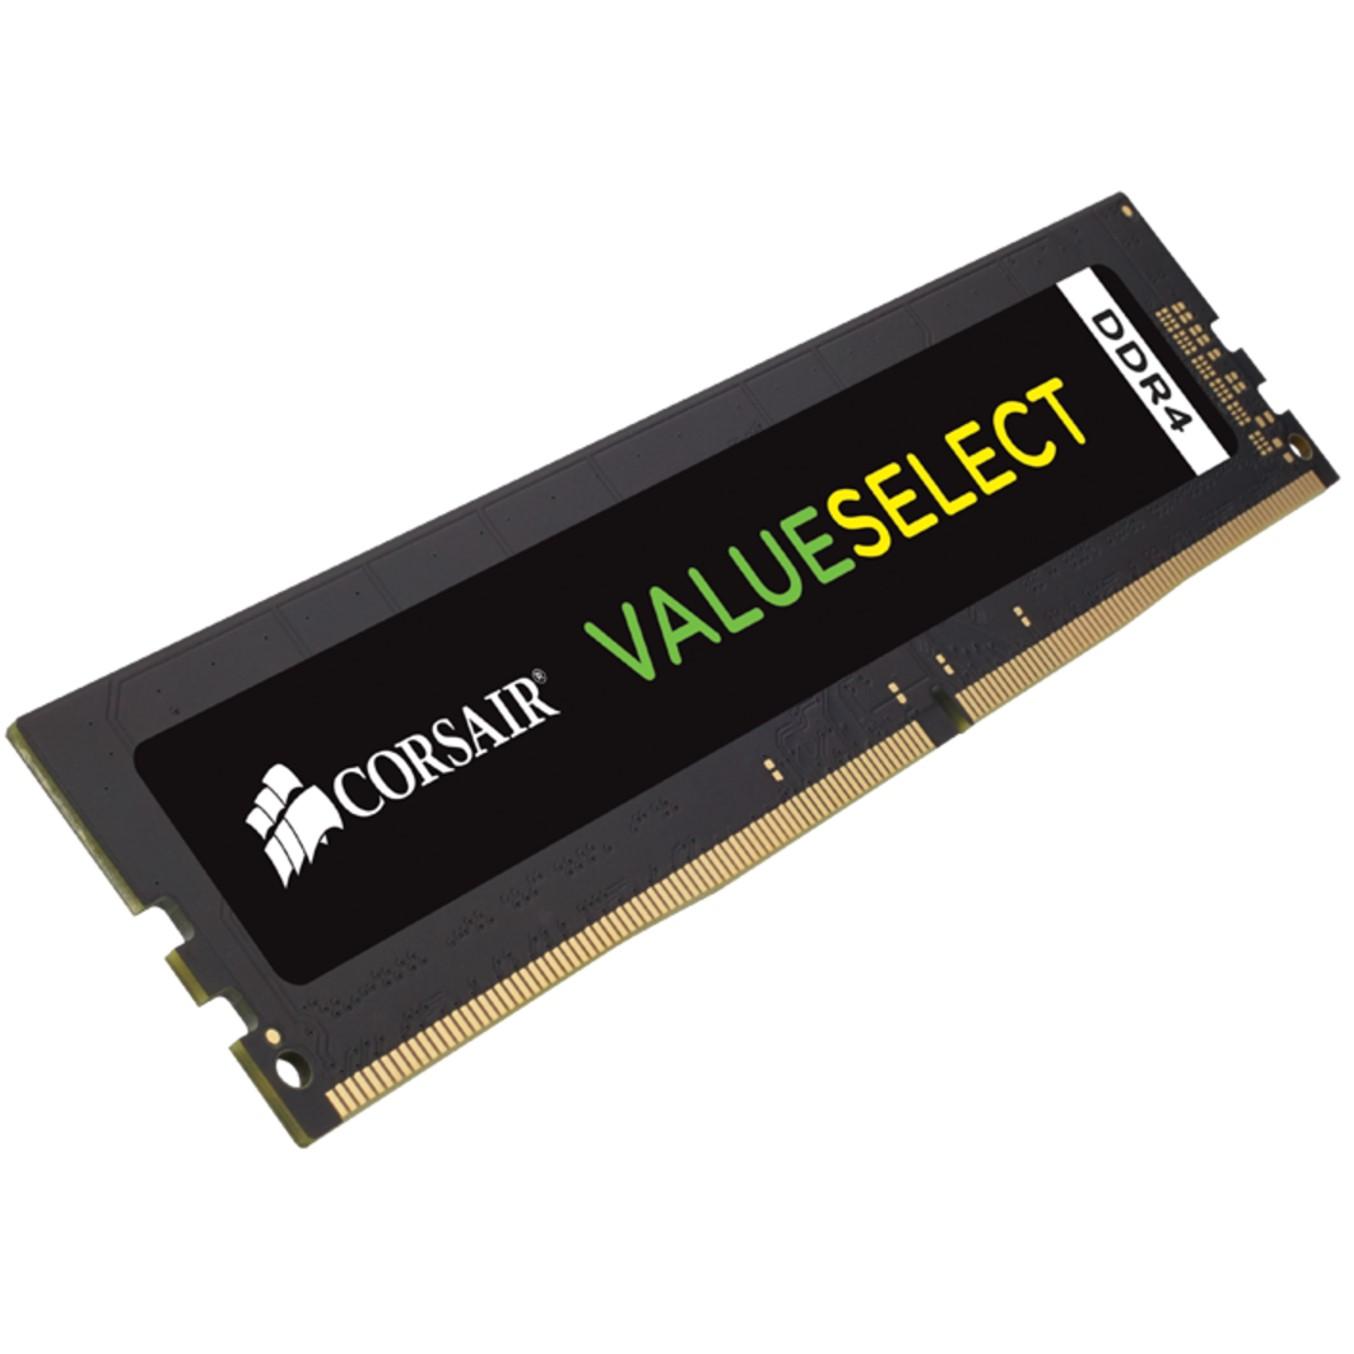 MEMORIA DDR4 8GB CORSAIR VALUESELECT   PC4-21300